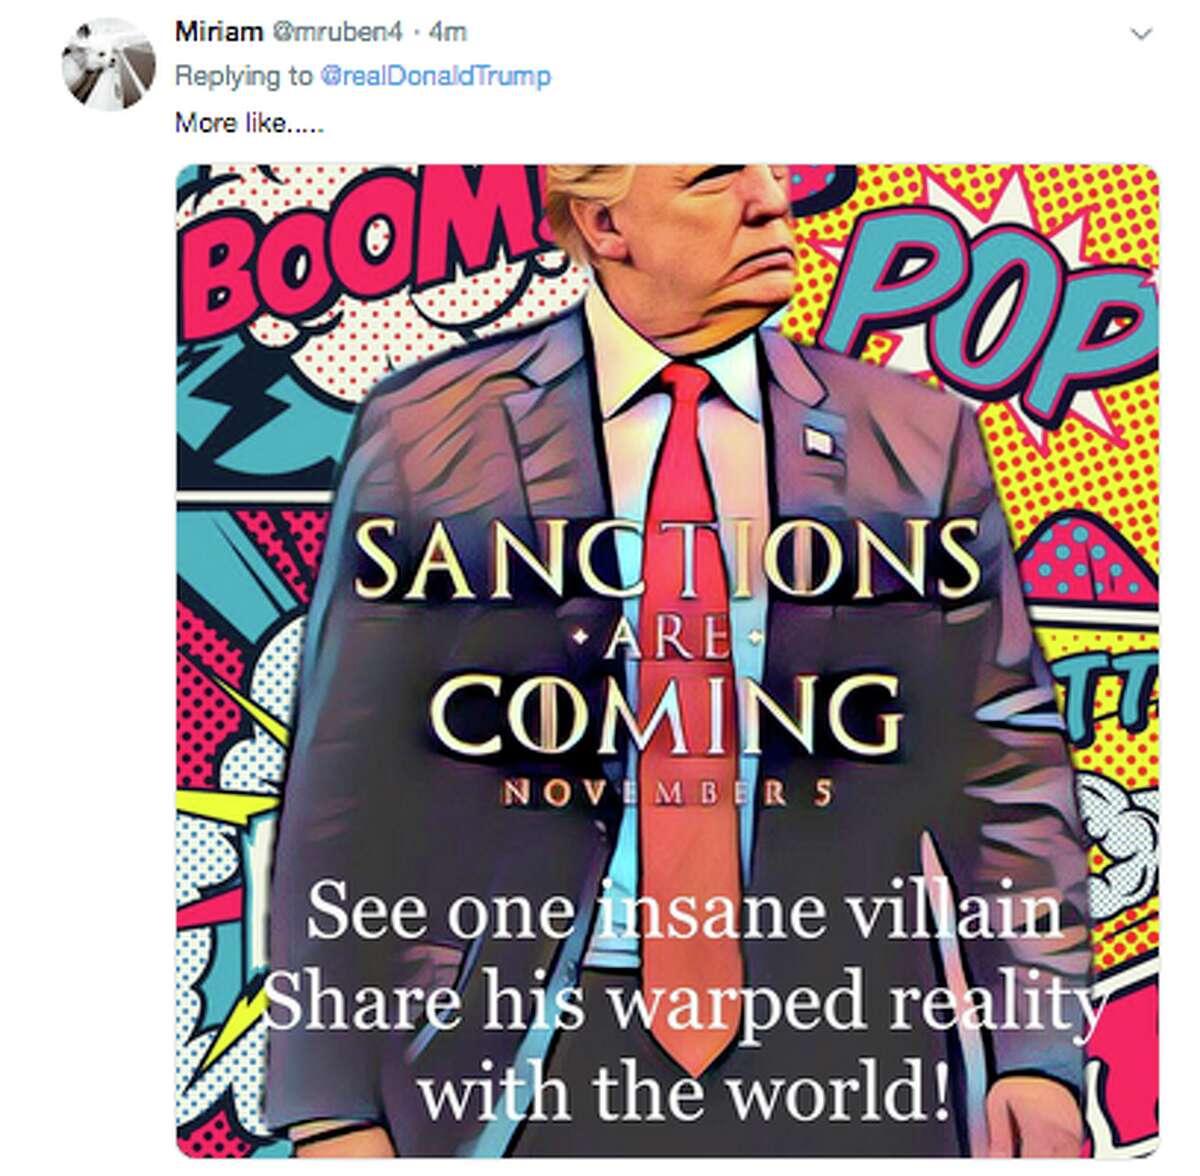 Twitter responds to President Donald Trump's sanctions tweet.